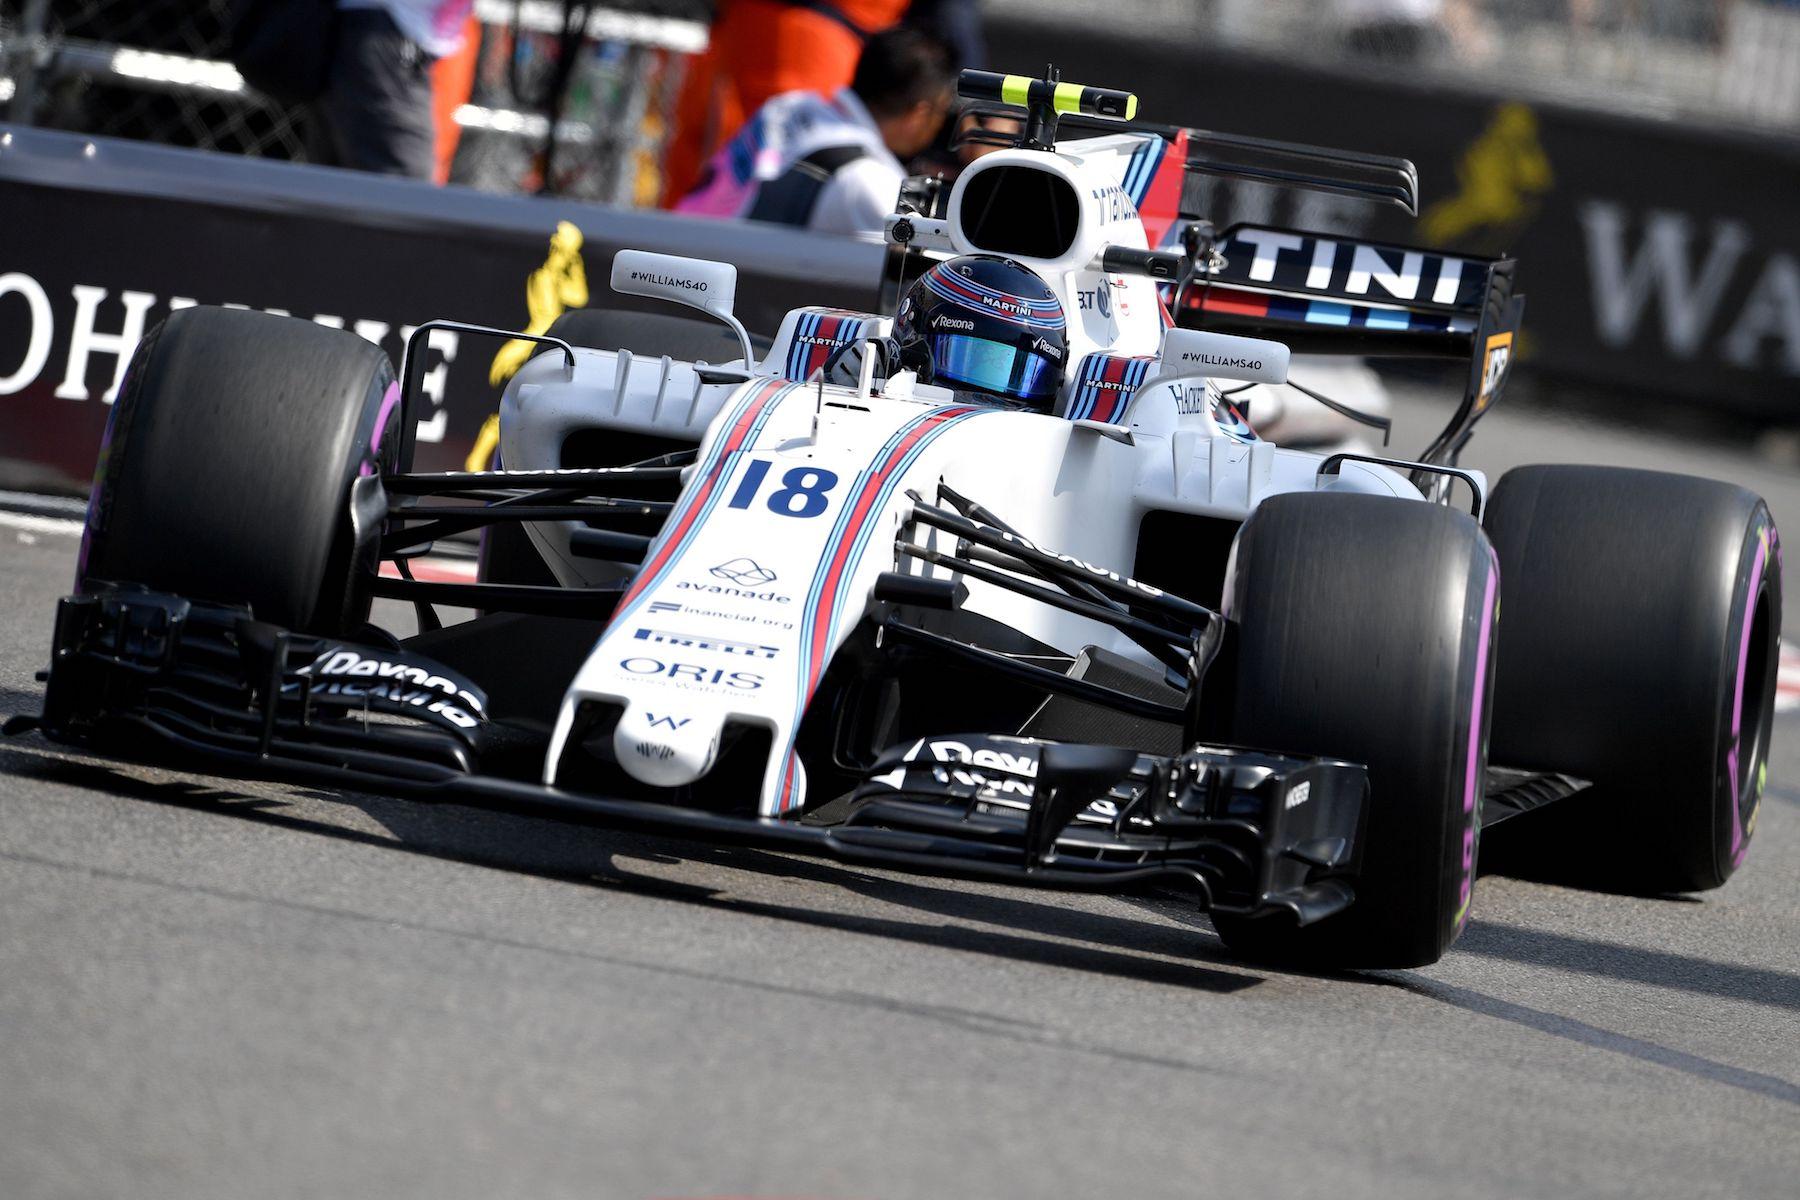 2017 Lance Stroll | Williams FW40 | 2017 Monaco GP FP2 1 copy.jpg